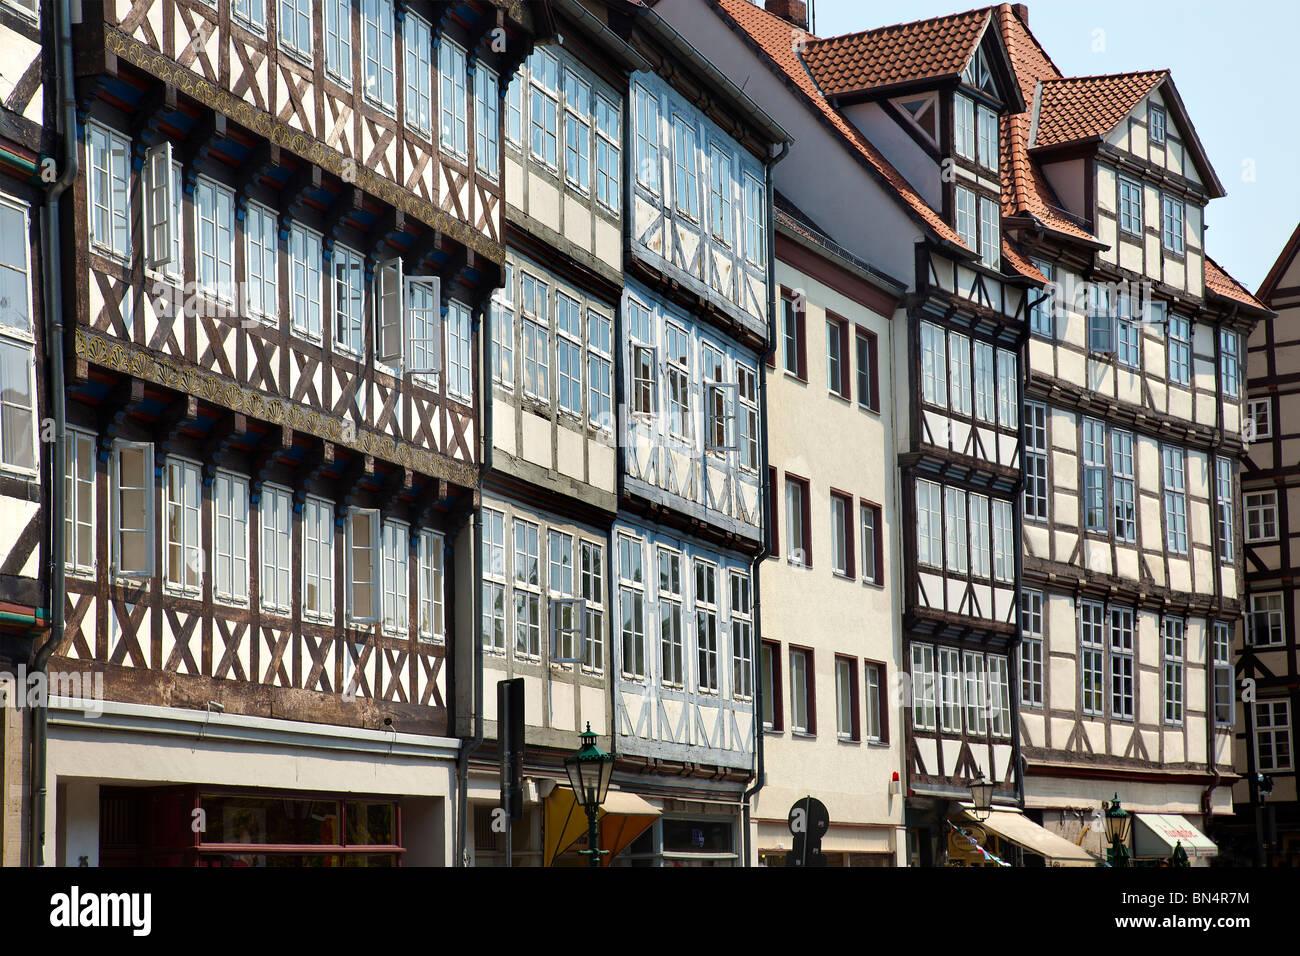 Altstadt, Burgstrasse, Hannover, Lower Saxony, Germany - Stock Image